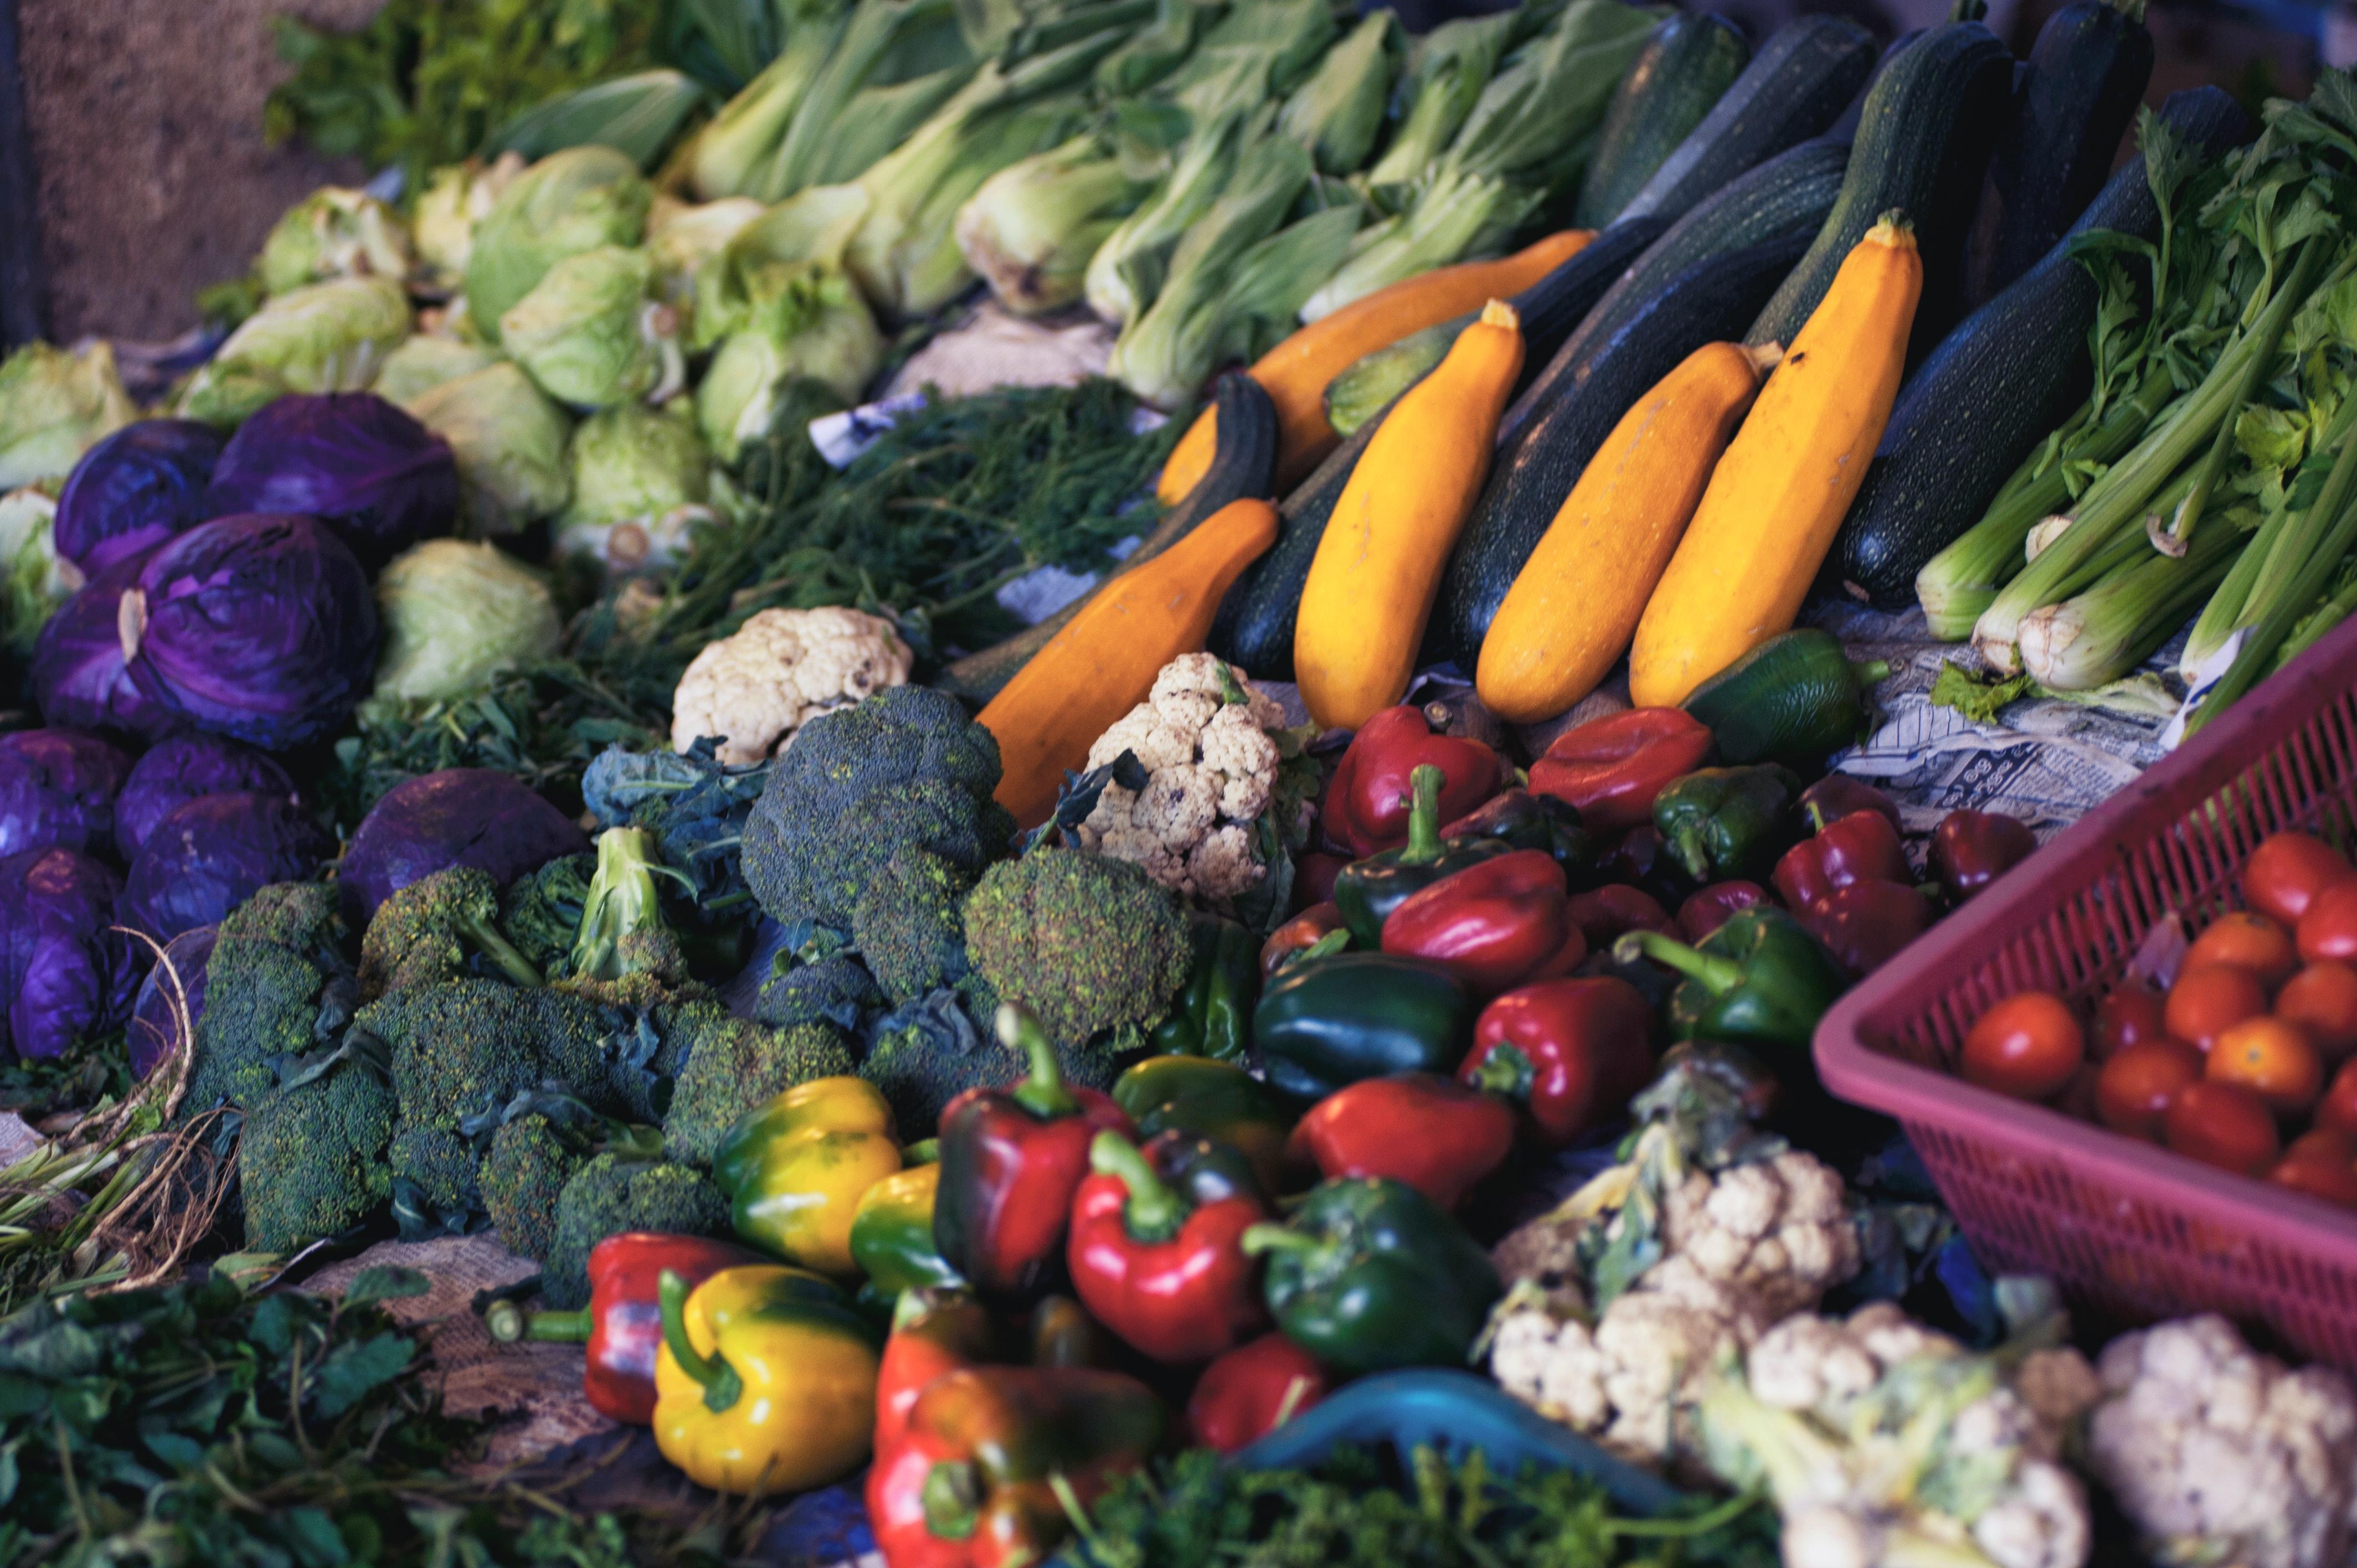 How to Build a Low Calorie Diet that Improves Your Longevity